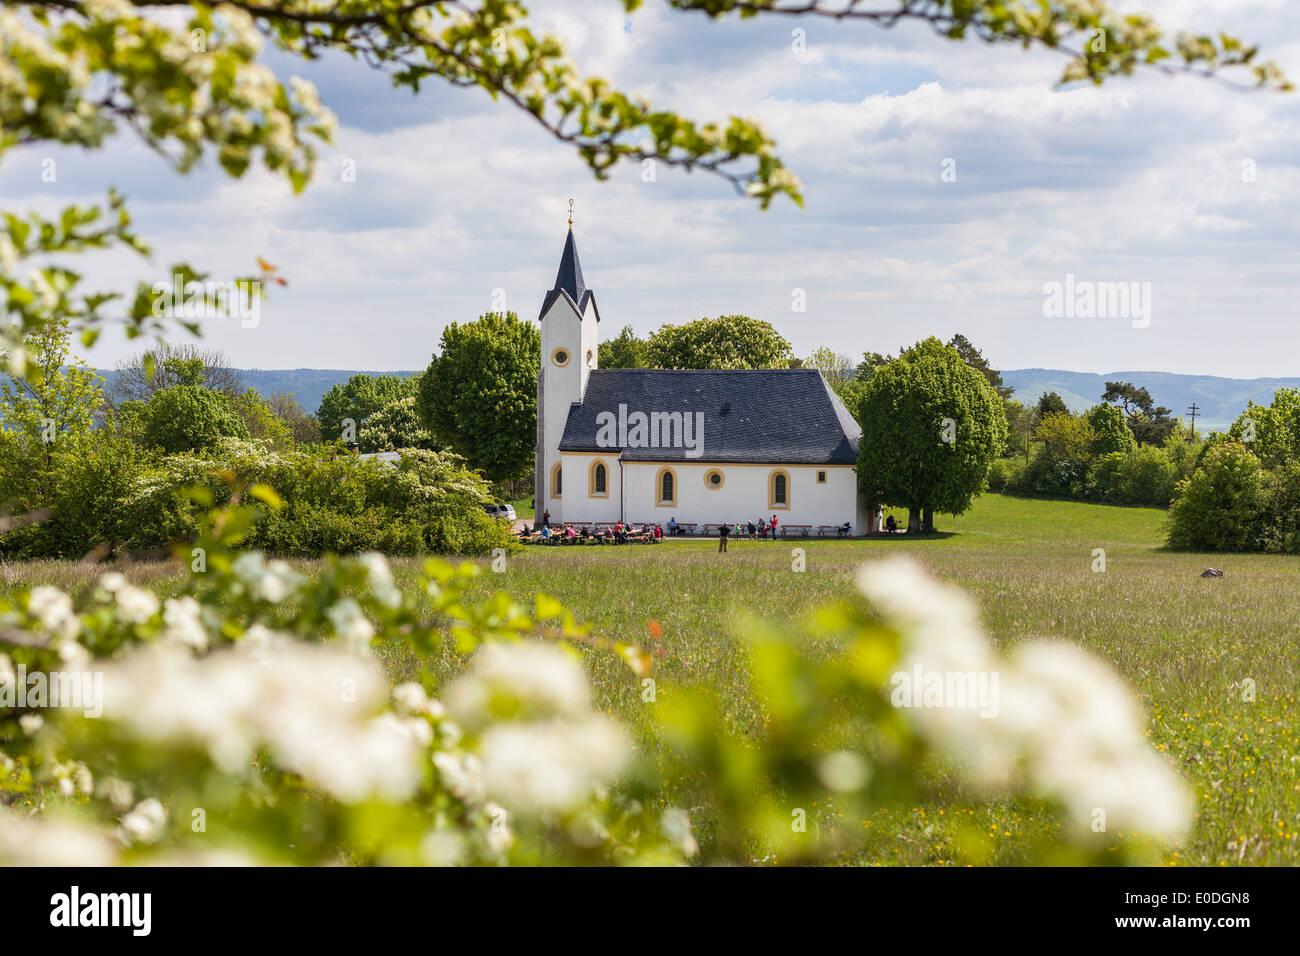 Adelgundis Chapell, Franconia - Stock Image